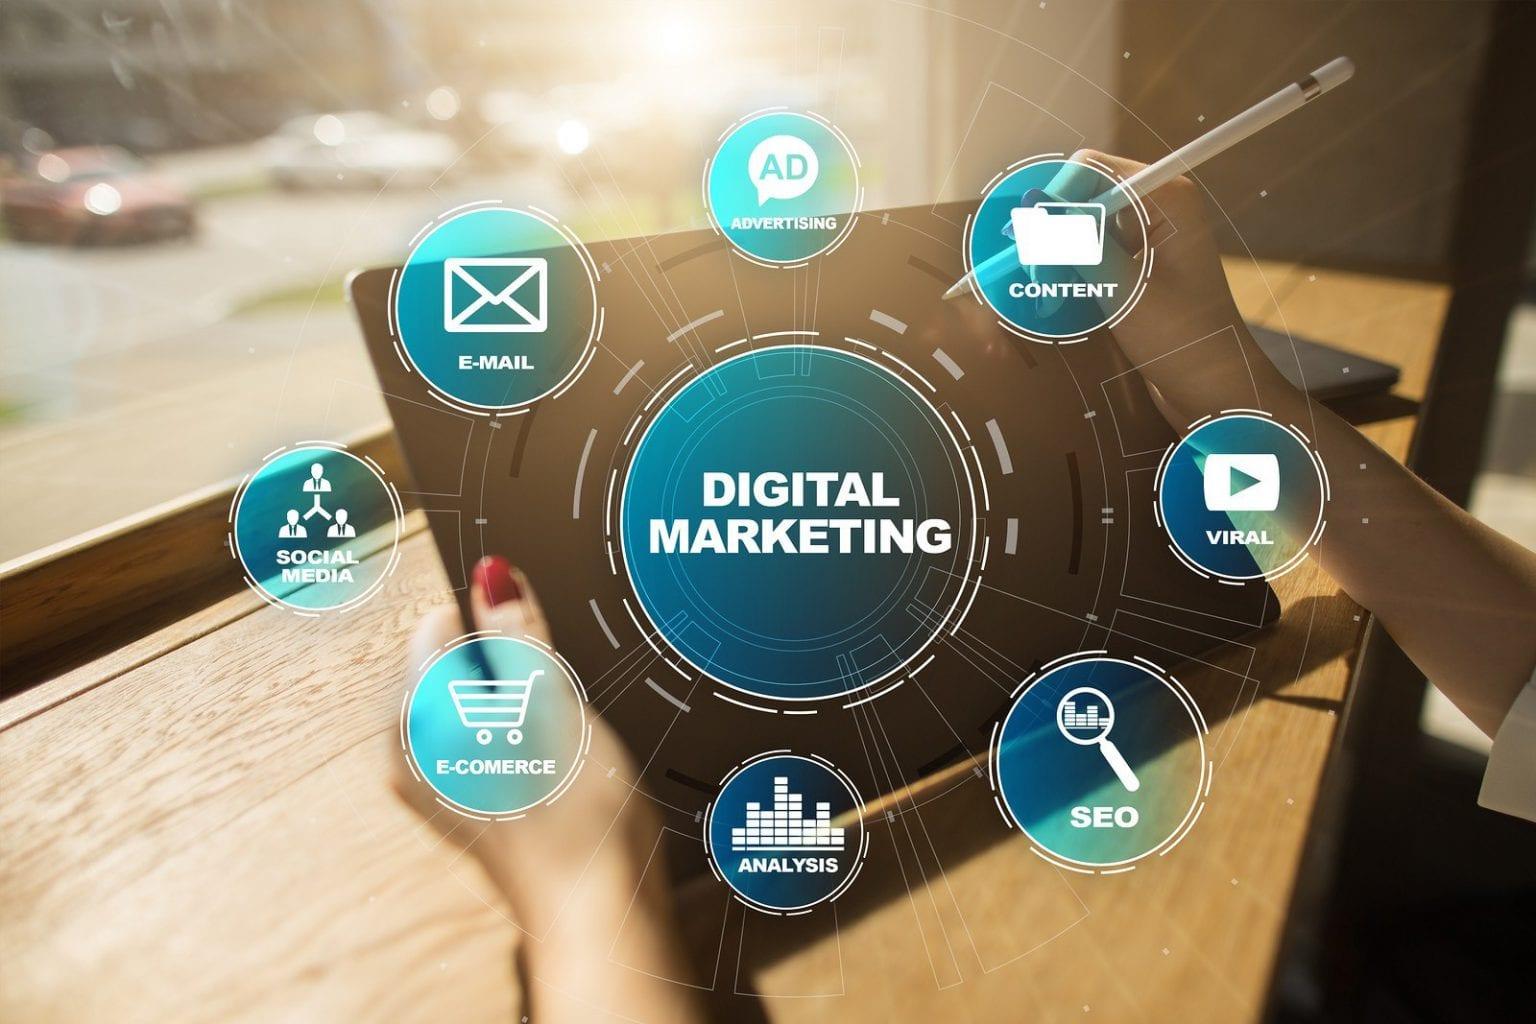 bigstock digital marketing technology c 2873148101559530148